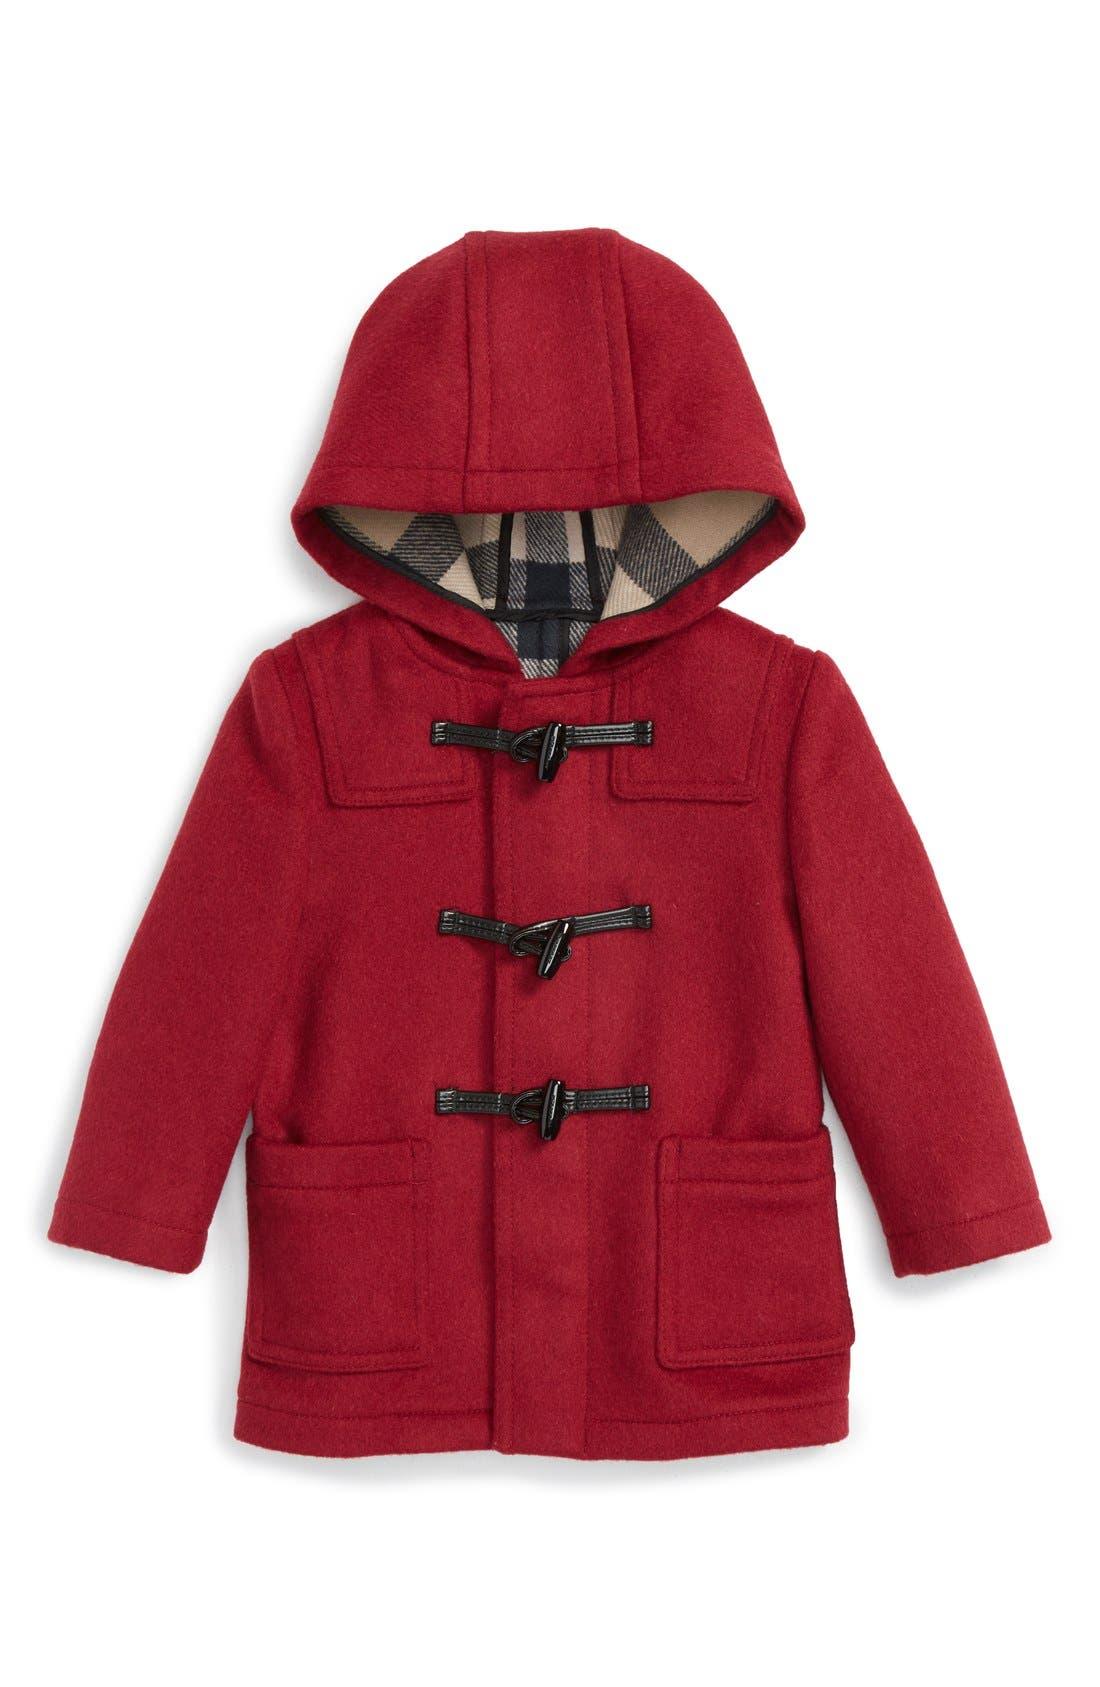 Alternate Image 1 Selected - Burberry 'Brogan' Hooded Wool Toggle Coat (Baby Girls)